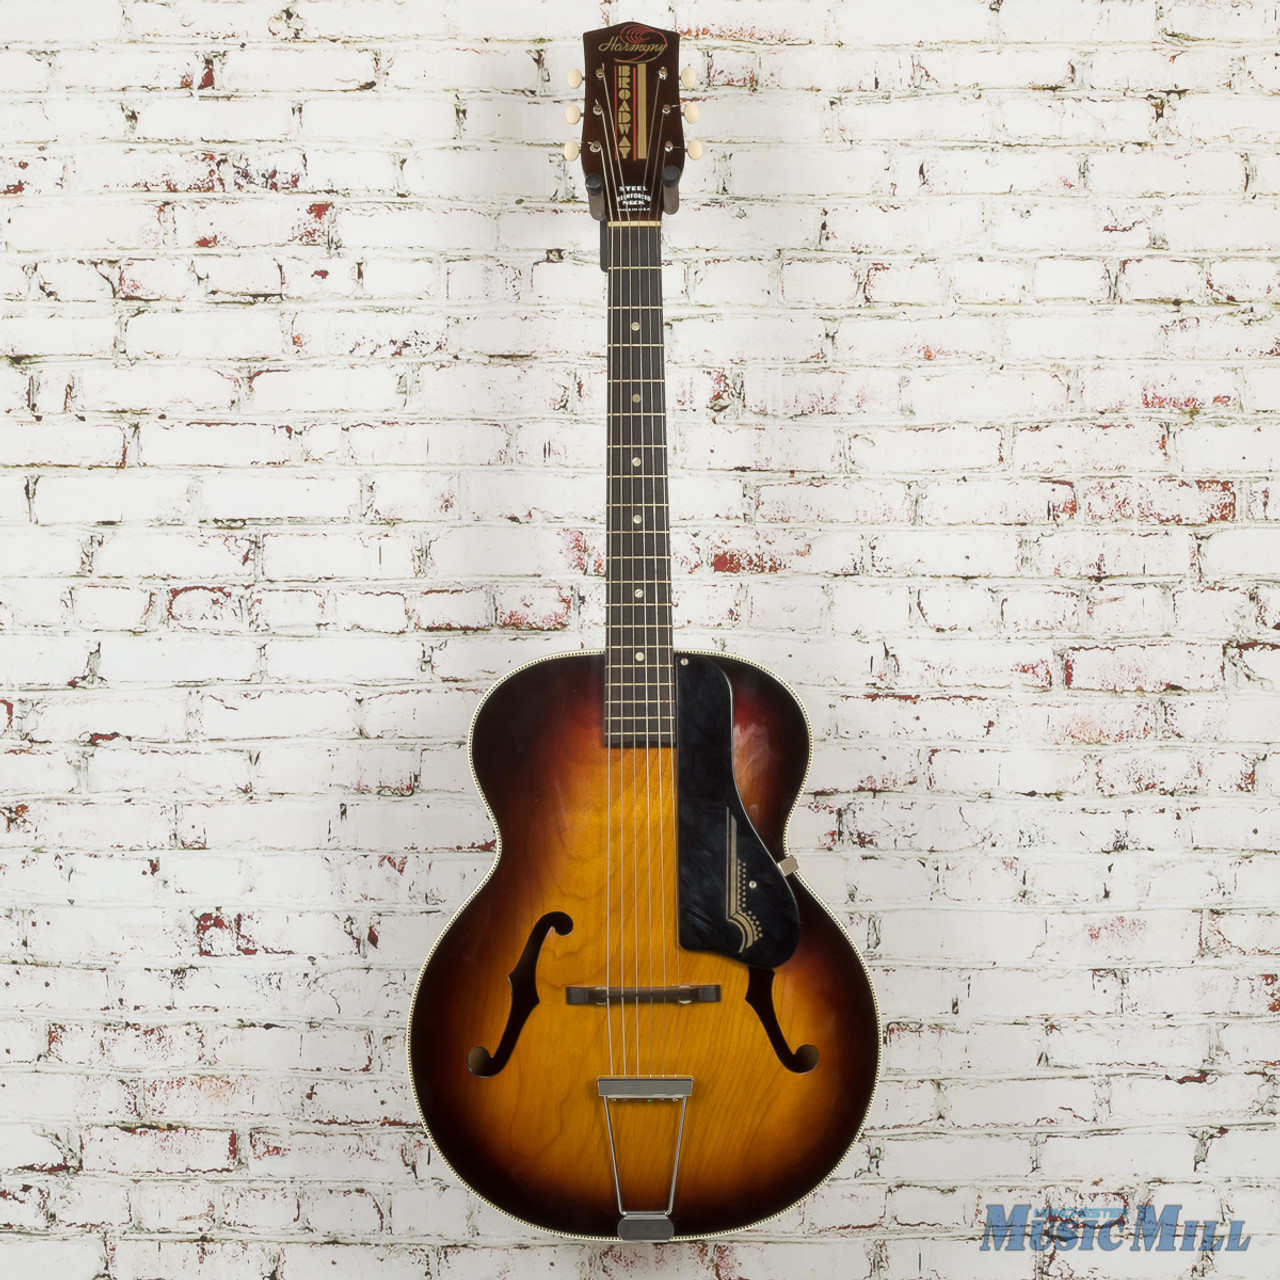 Vintage 1965 Harmony H954 Broadway Archtop Acoustic Guitar 2 Tone Sunburst